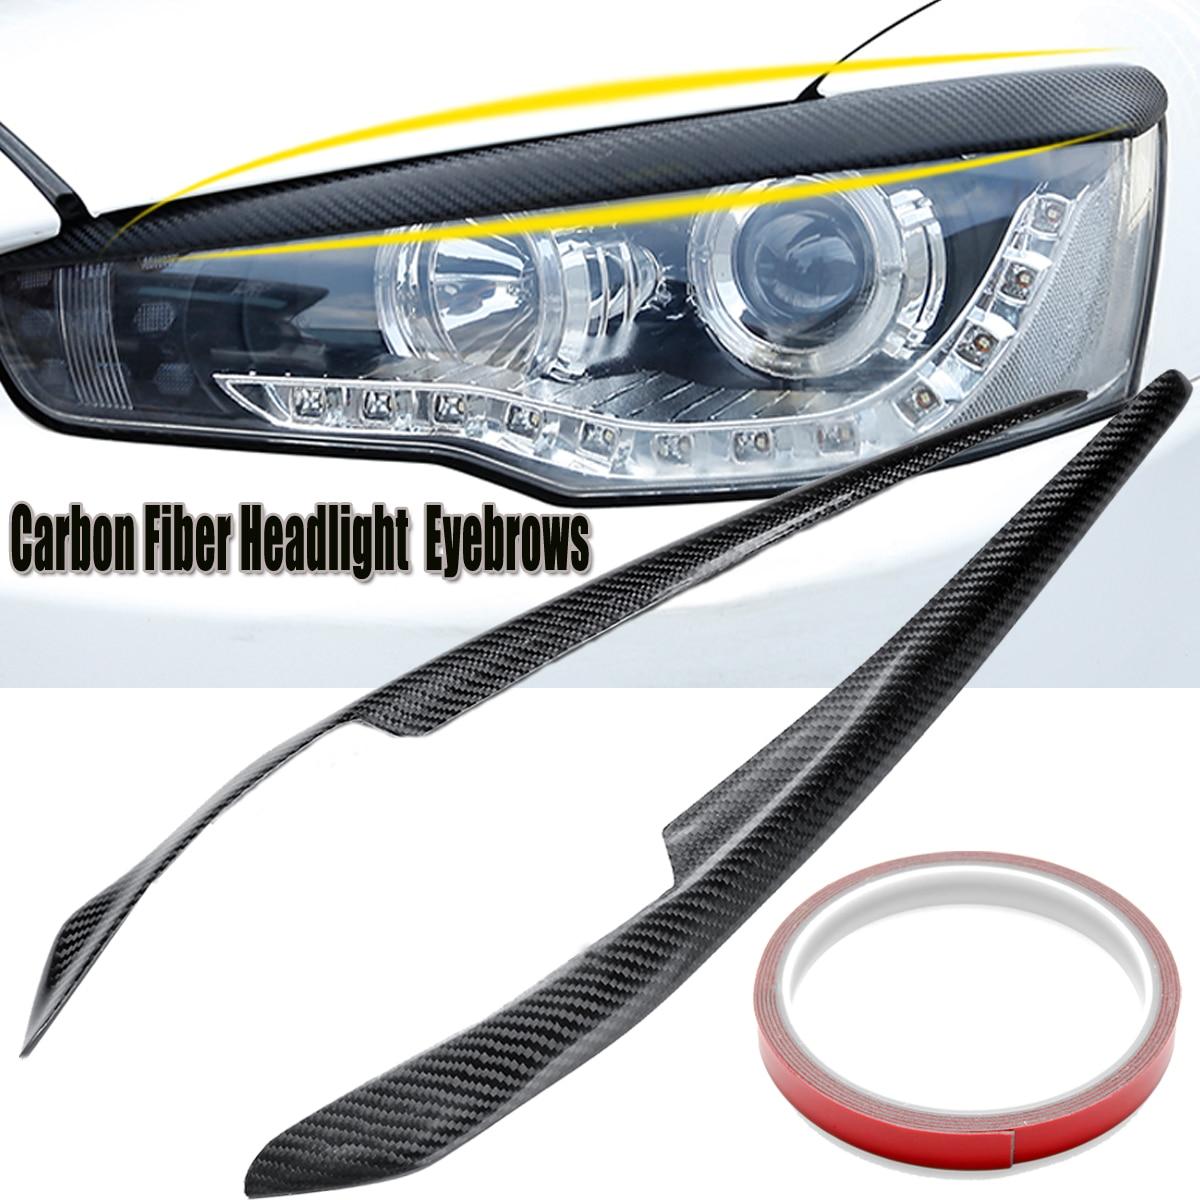 2pcs Car Headlight Eyelids Eyebrows Carbon Fiber Pattern for Mitsubishi Lancer EVO X 10 2008-2014 Car Styling 2001 2007 for mitsubishi lancer evolution evo 7 8 9 carbon fiber eyebrows eyelids headlight